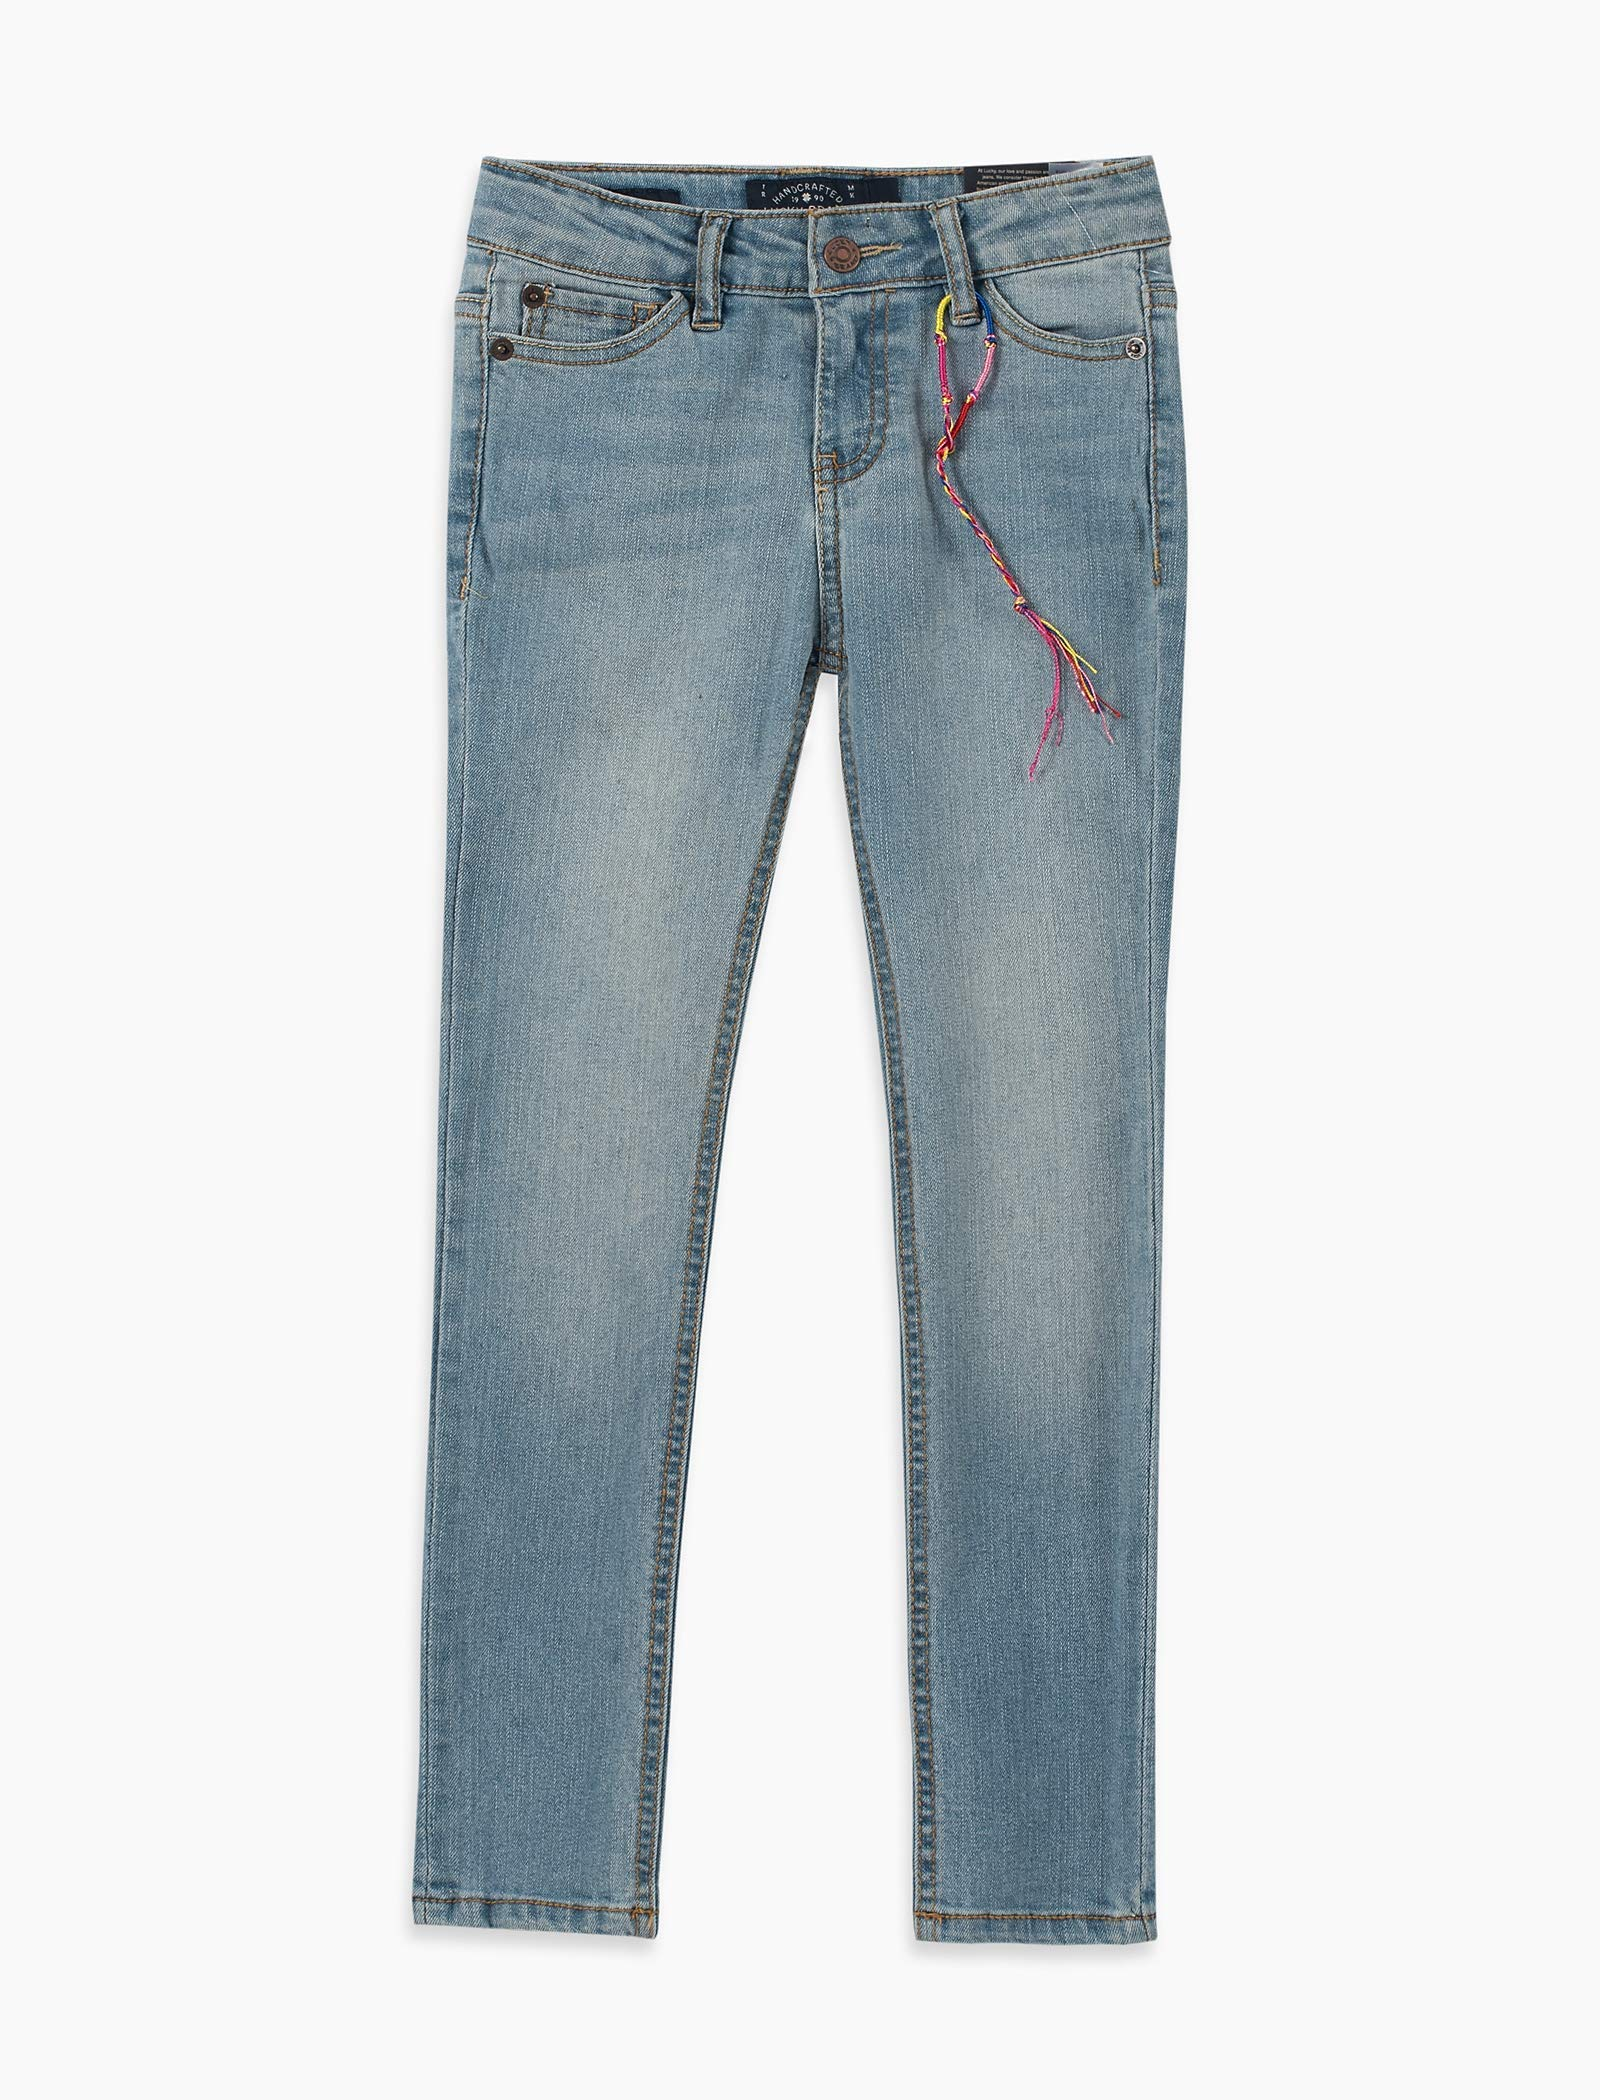 Lucky Brand Boys' Little 5-Pocket Classic Straight Jean, Yorba Linda, 5